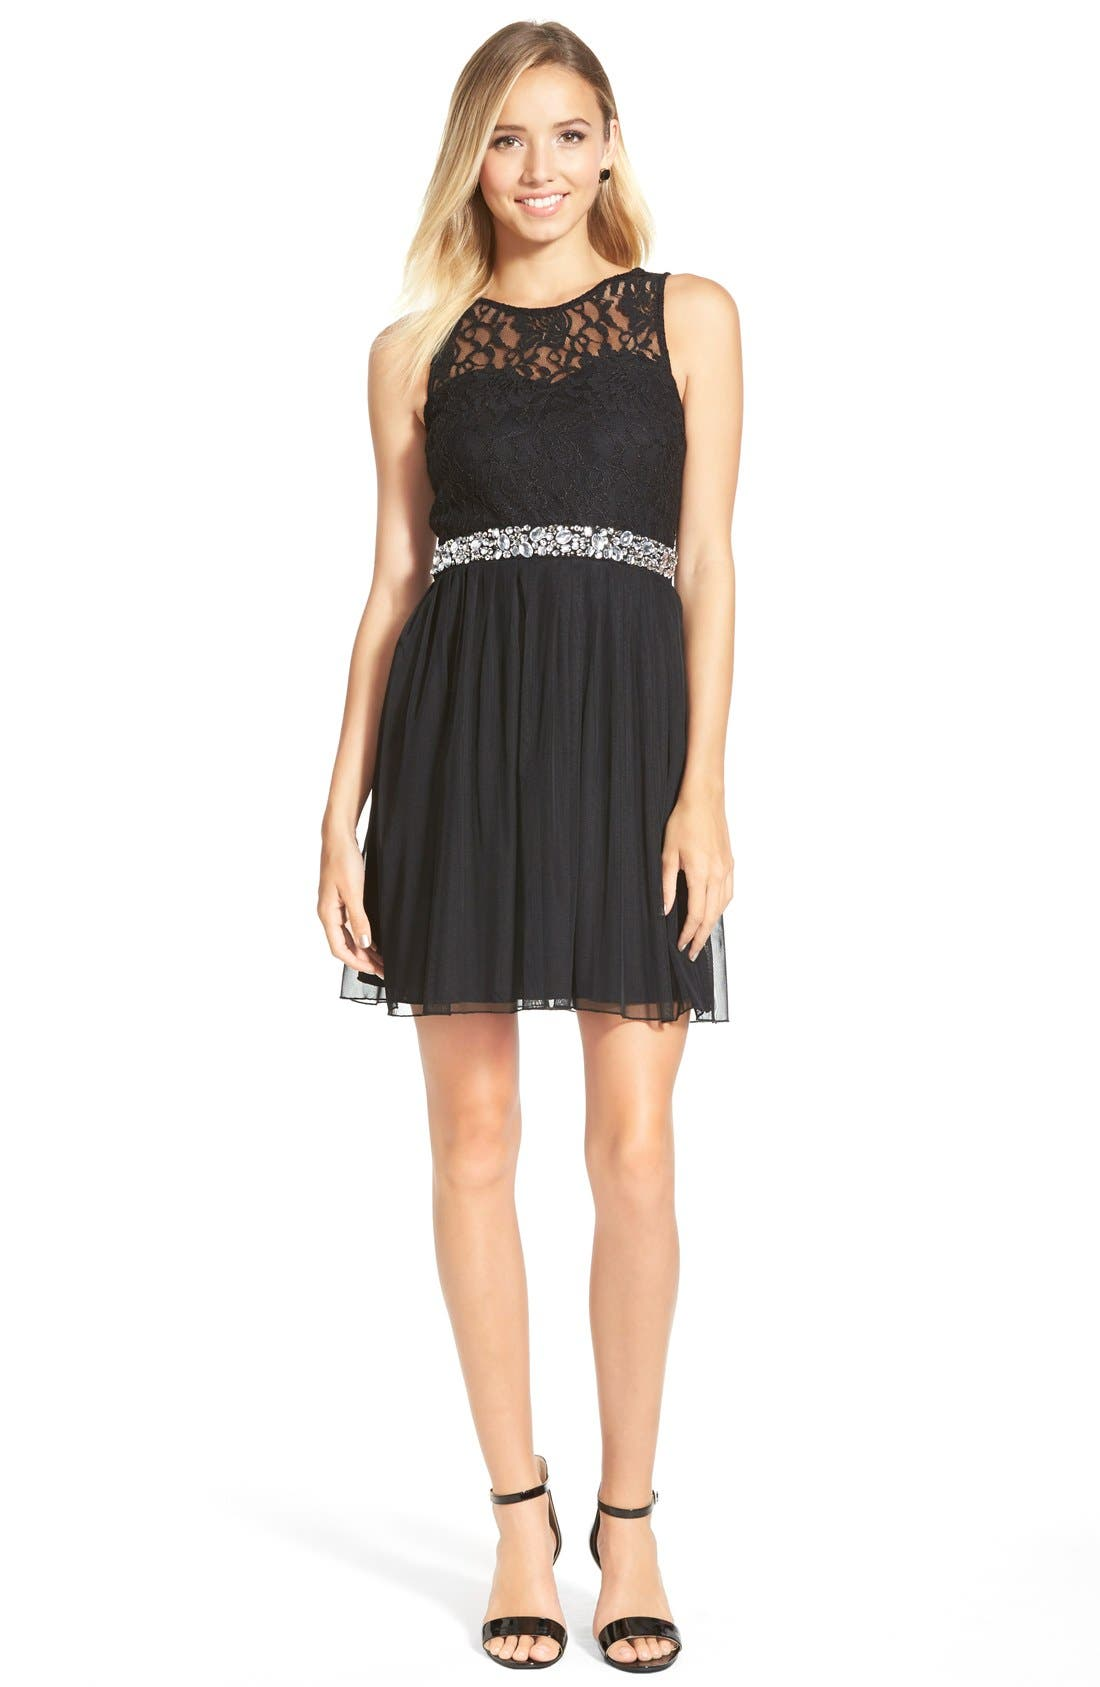 Alternate Image 1 Selected - Speechless Embellished Lace Bodice Skater Dress (Juniors)